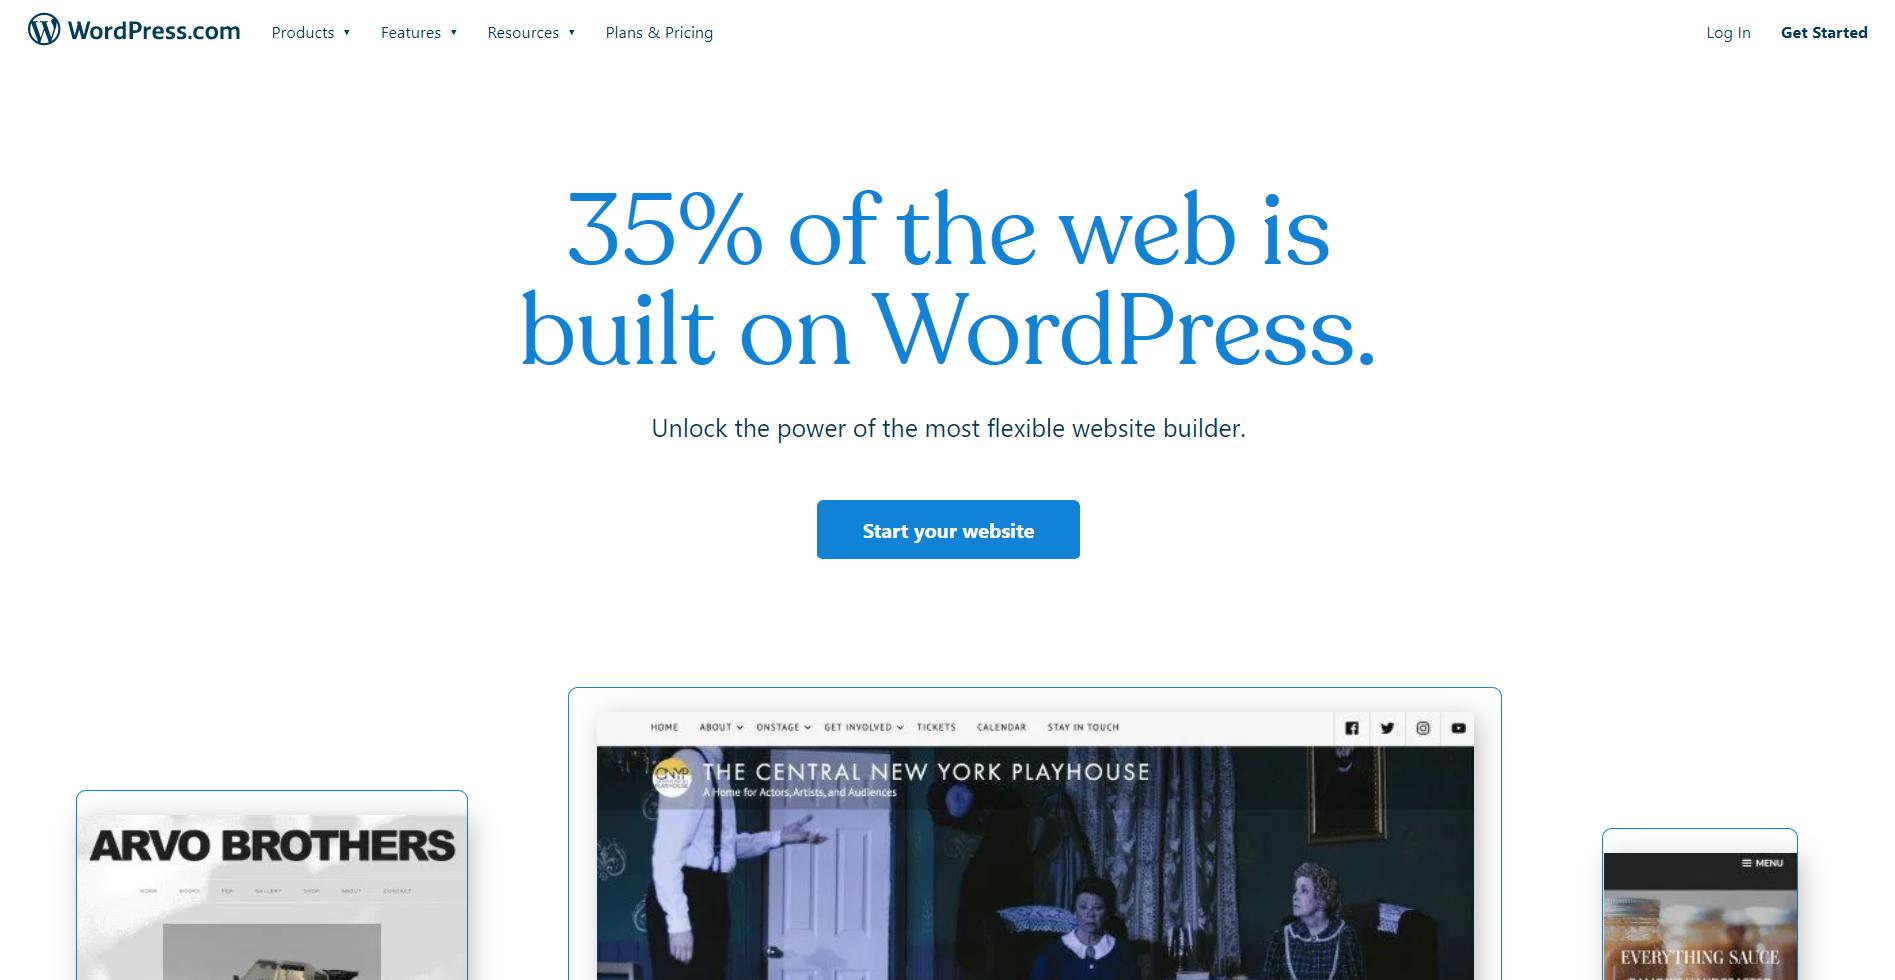 A screenshot of a WordPress webpage